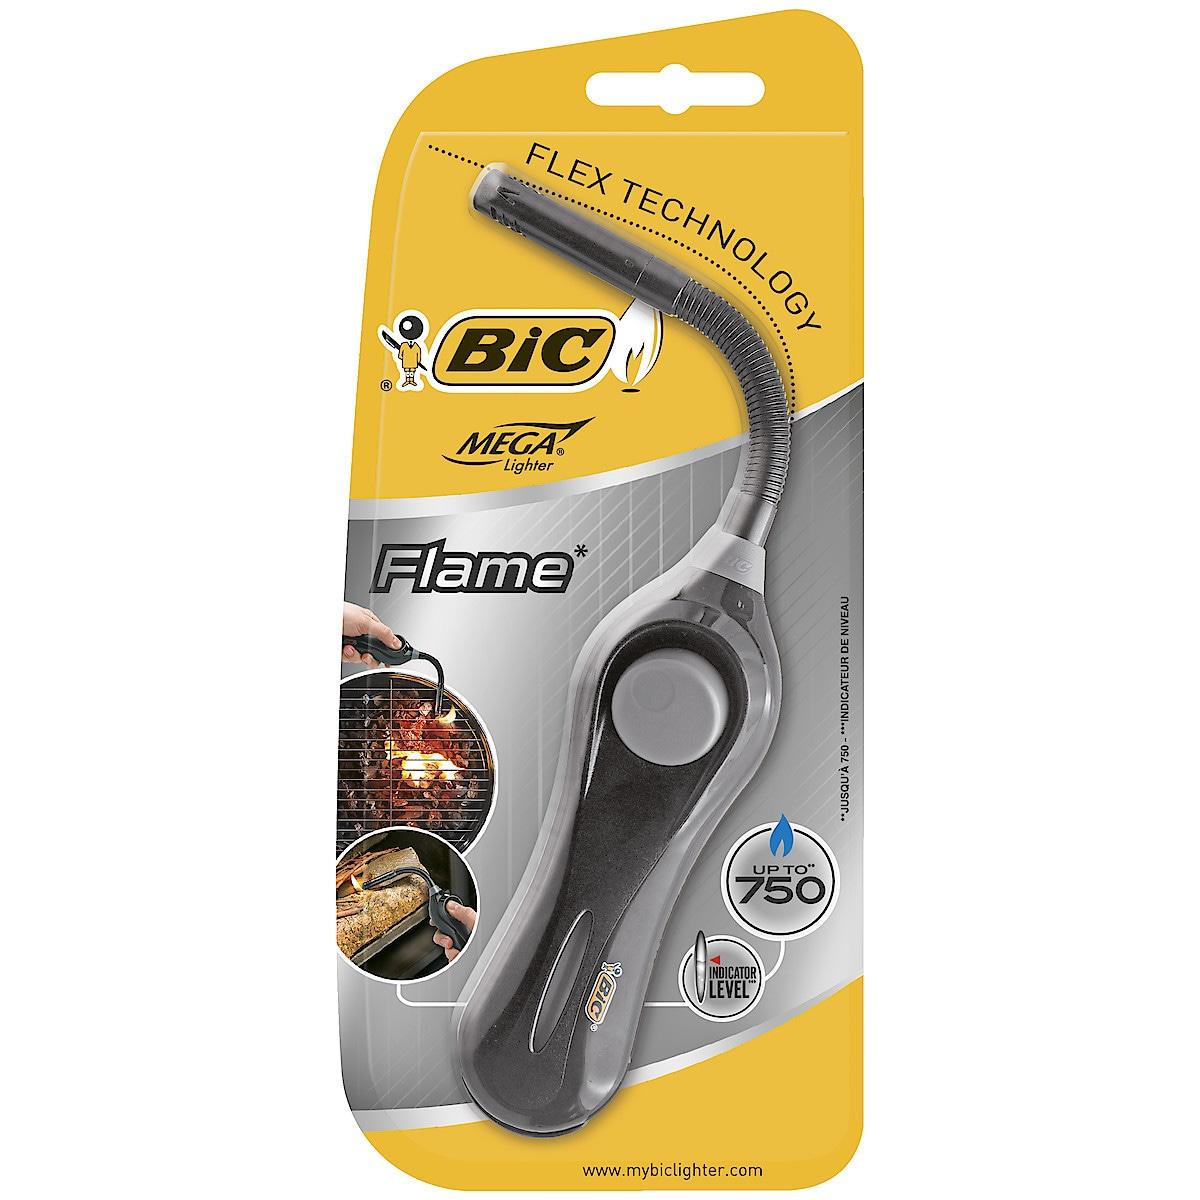 Braständare Bic Megalighter Flame